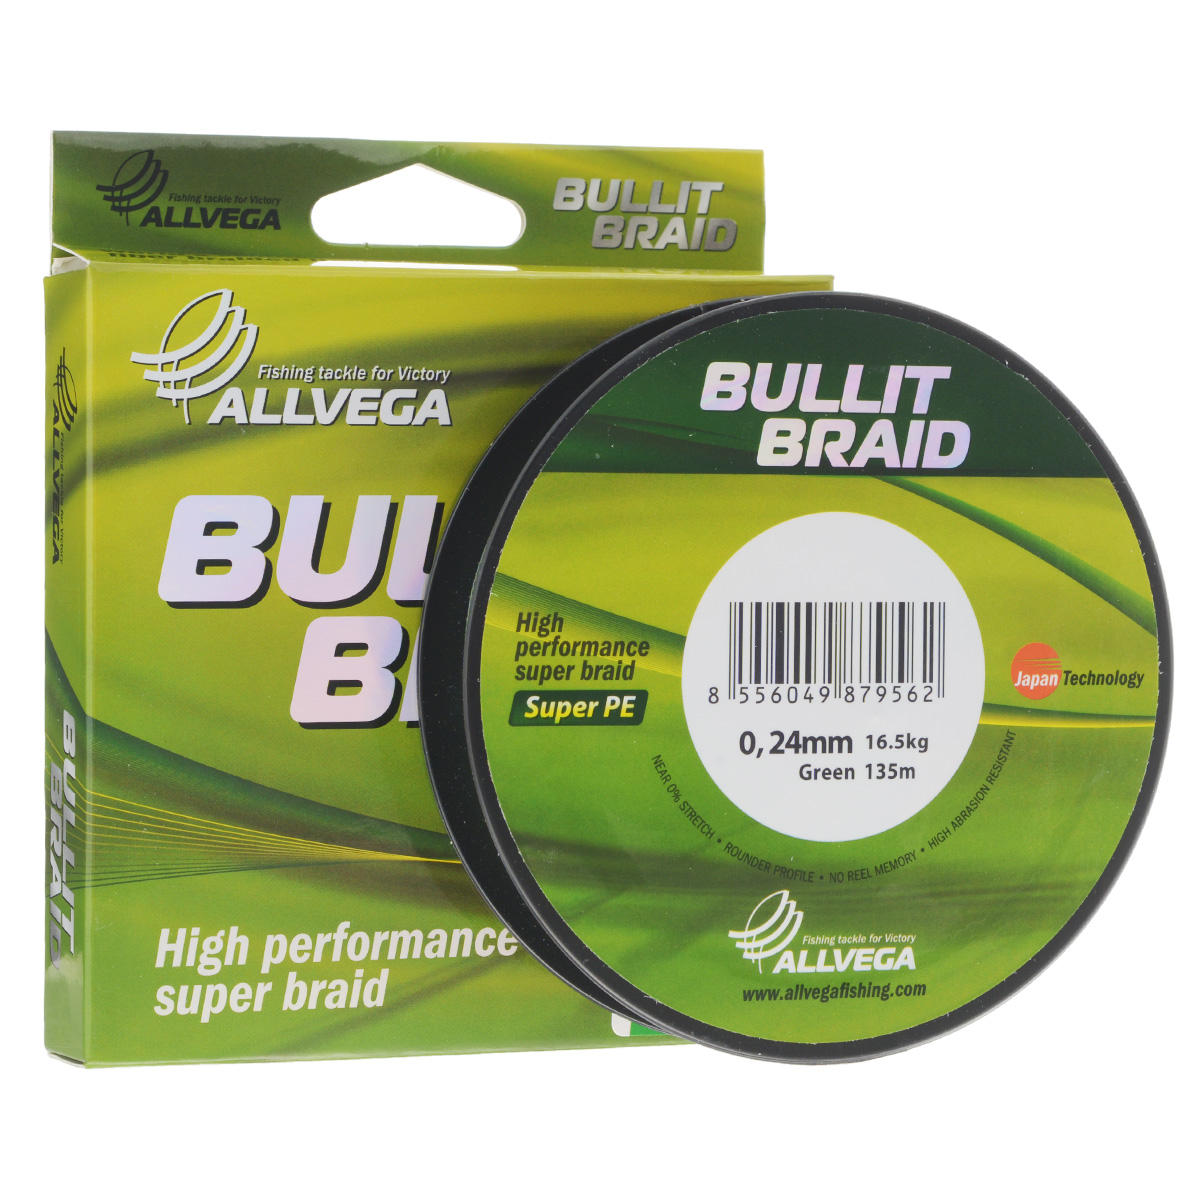 Леска плетеная Allvega Bullit Braid, цвет: темно-зеленый, 135 м, 0,24 мм, 16,5 кг